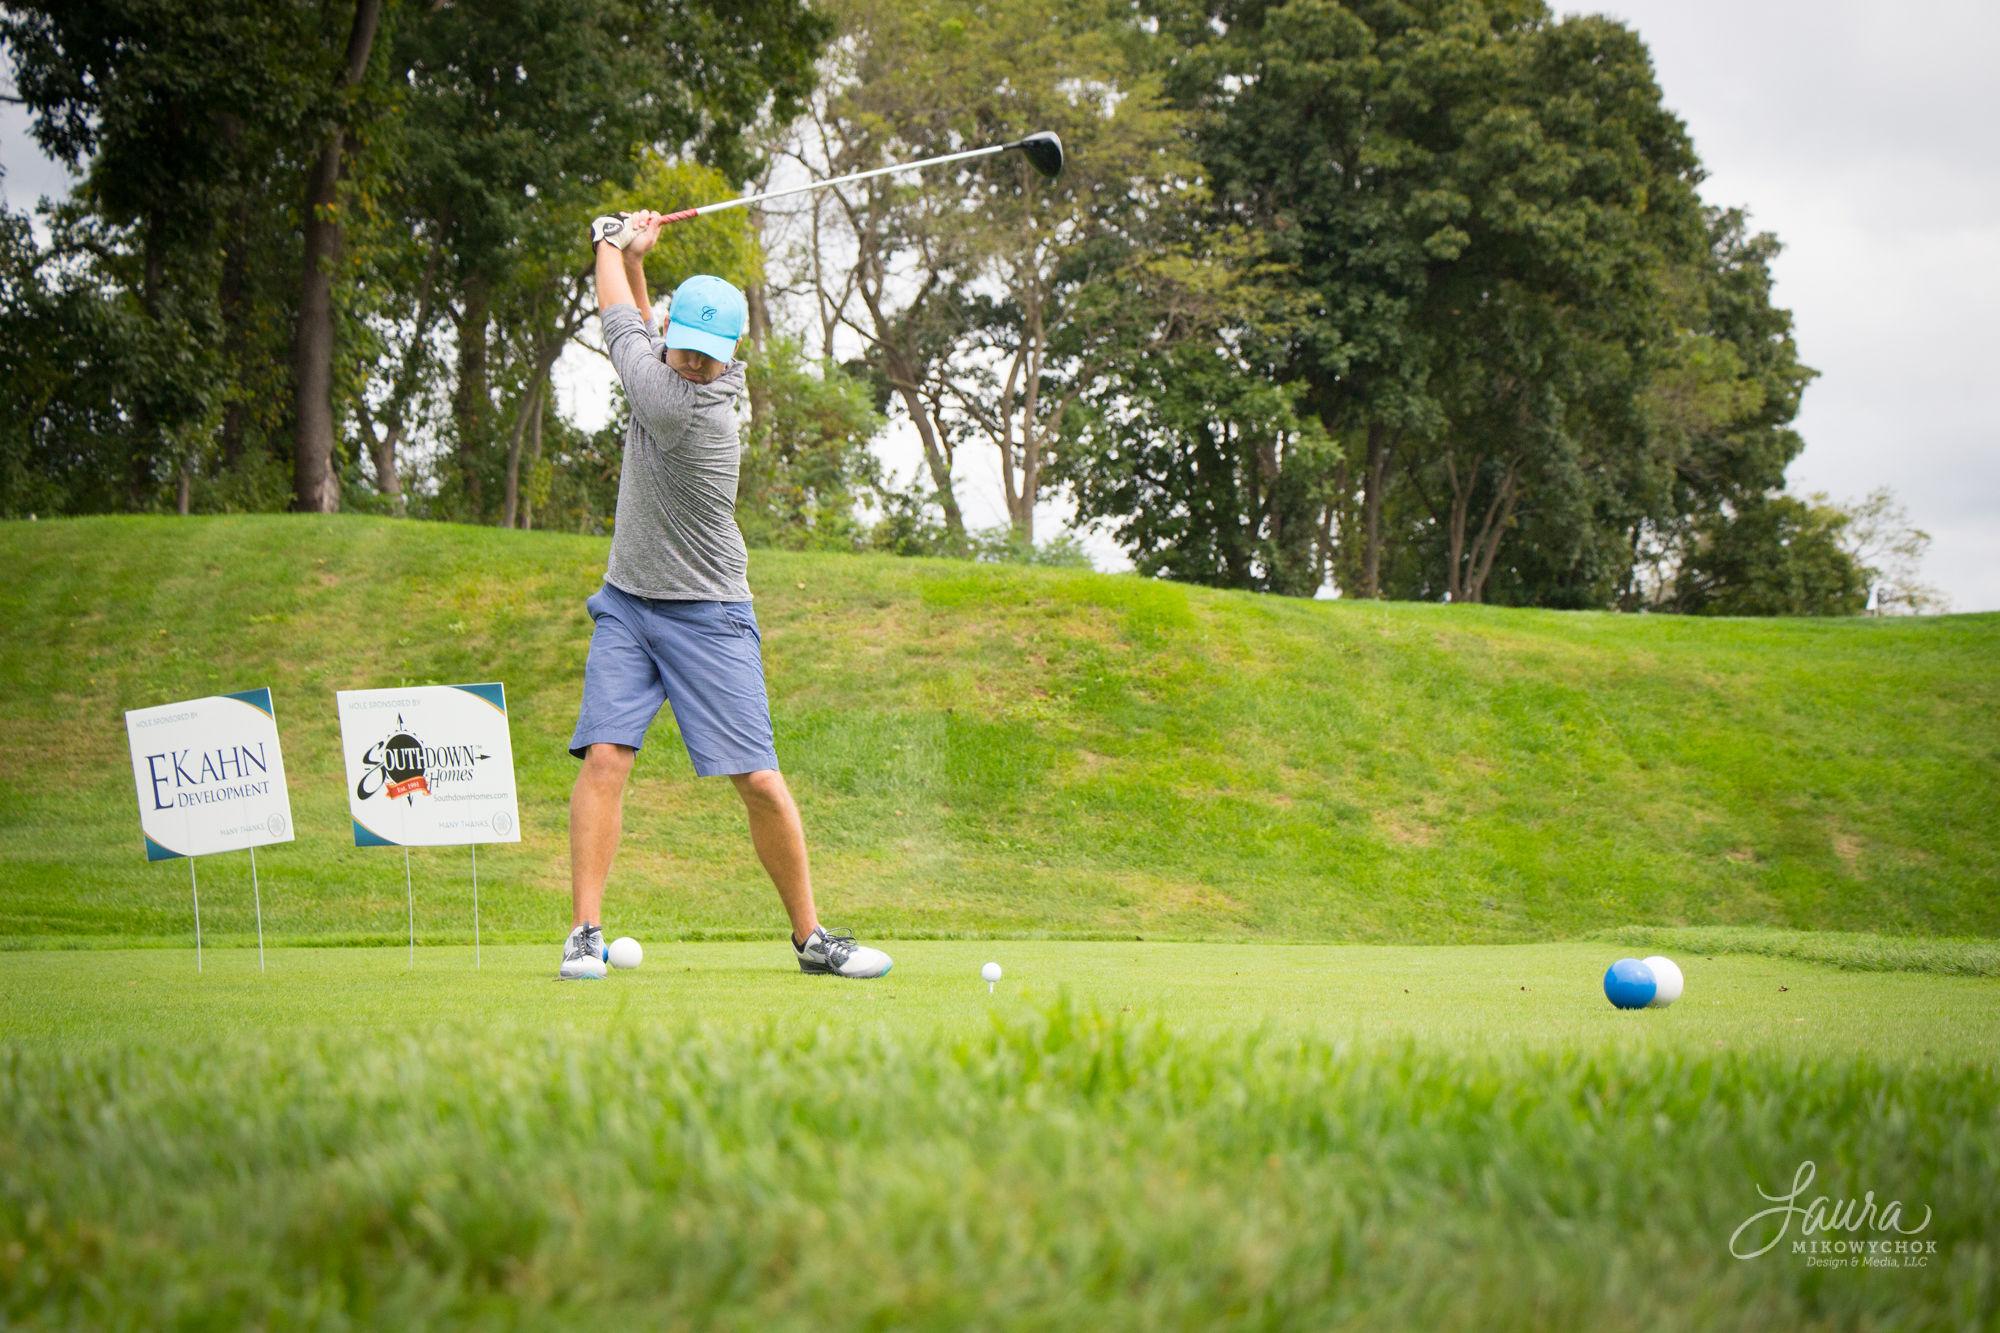 Jack Loew Charity Golf Tournament – Team CMMD Foundation